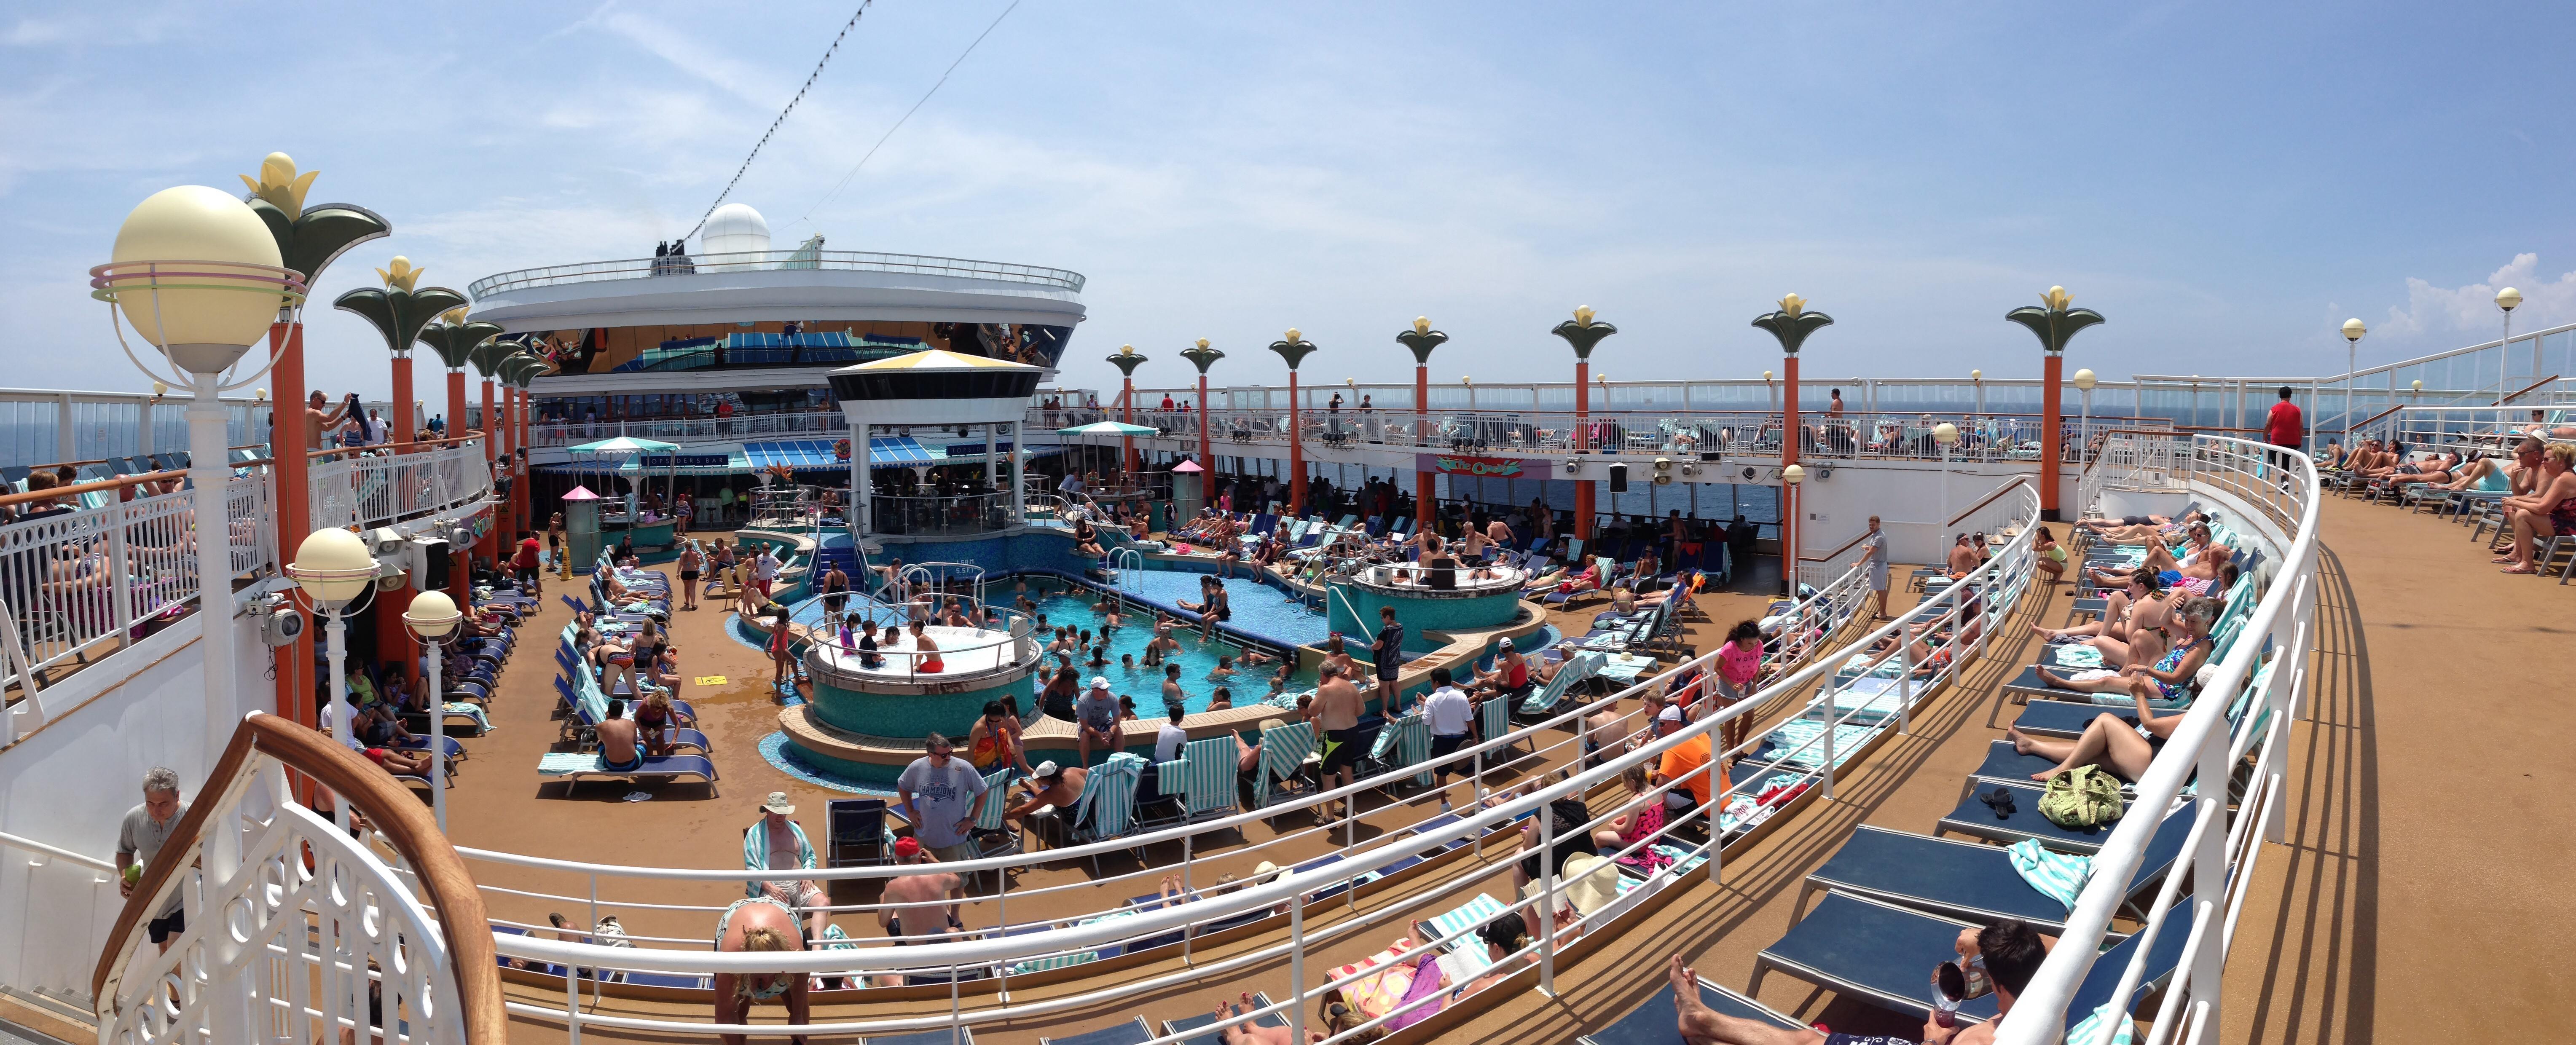 Norwegian Dawn Cruise Review Jul Okay - Cruises from boston to bermuda